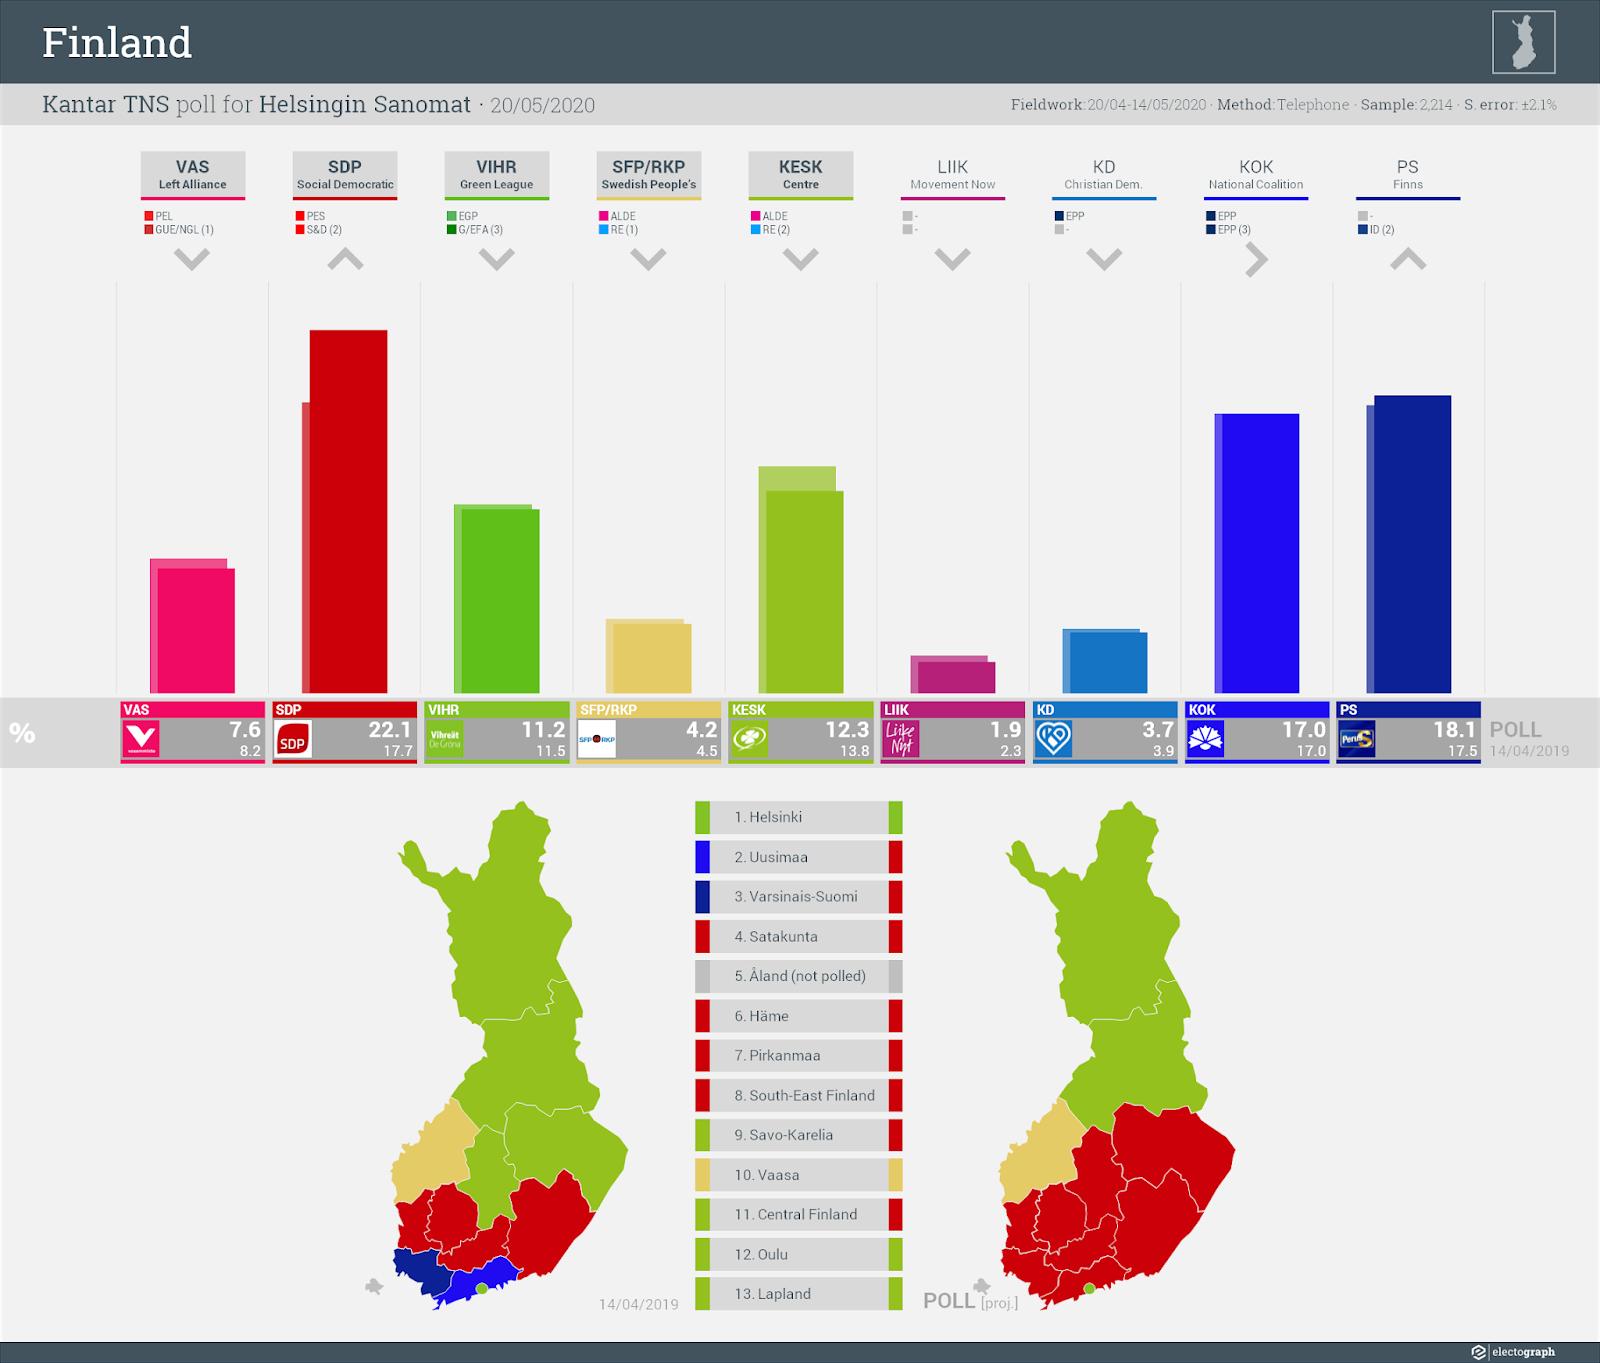 FINLAND: Kantar TNS poll chart for Helsingin Sanomat, 20 May 2020